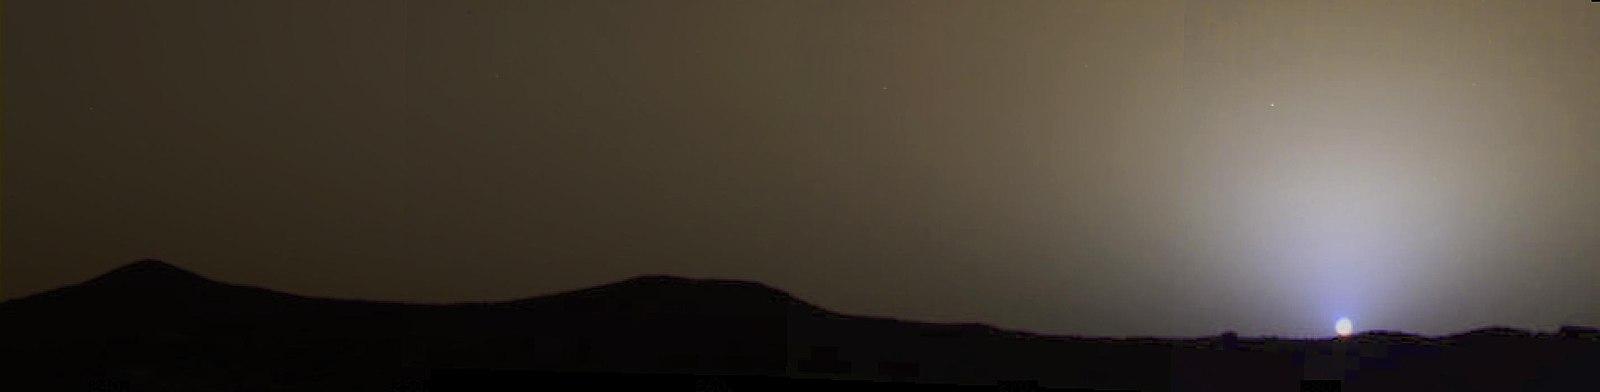 curiosity sunrise sunset times - 2853×699